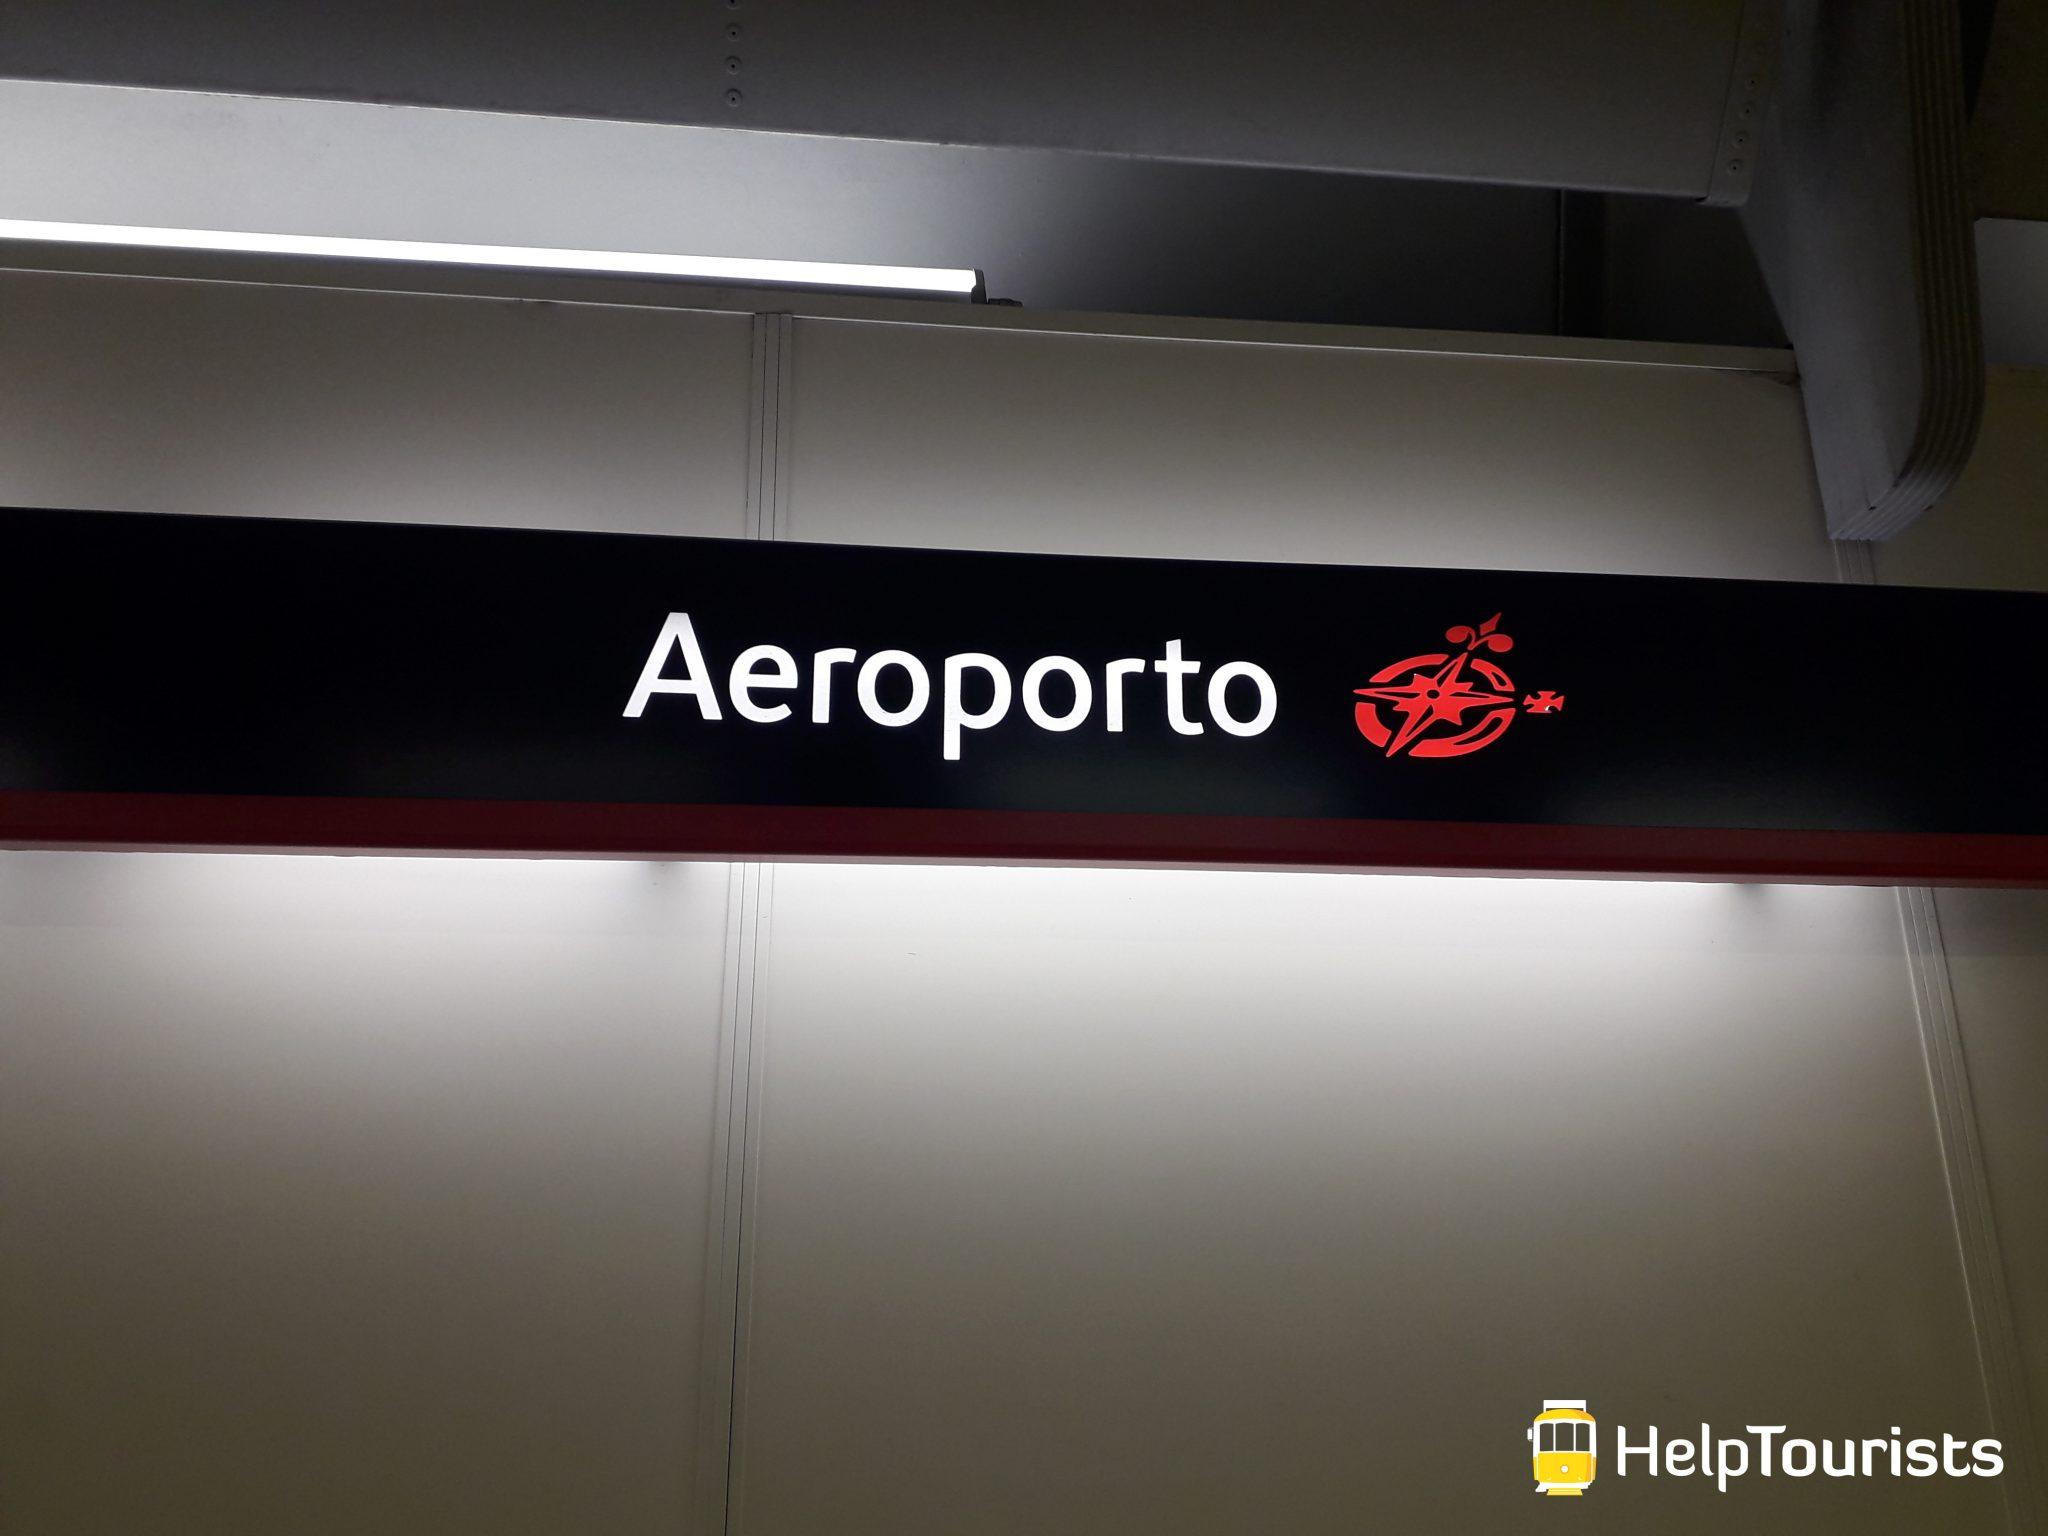 Lissabon Flughafen U-Bahn Station Aeroporto